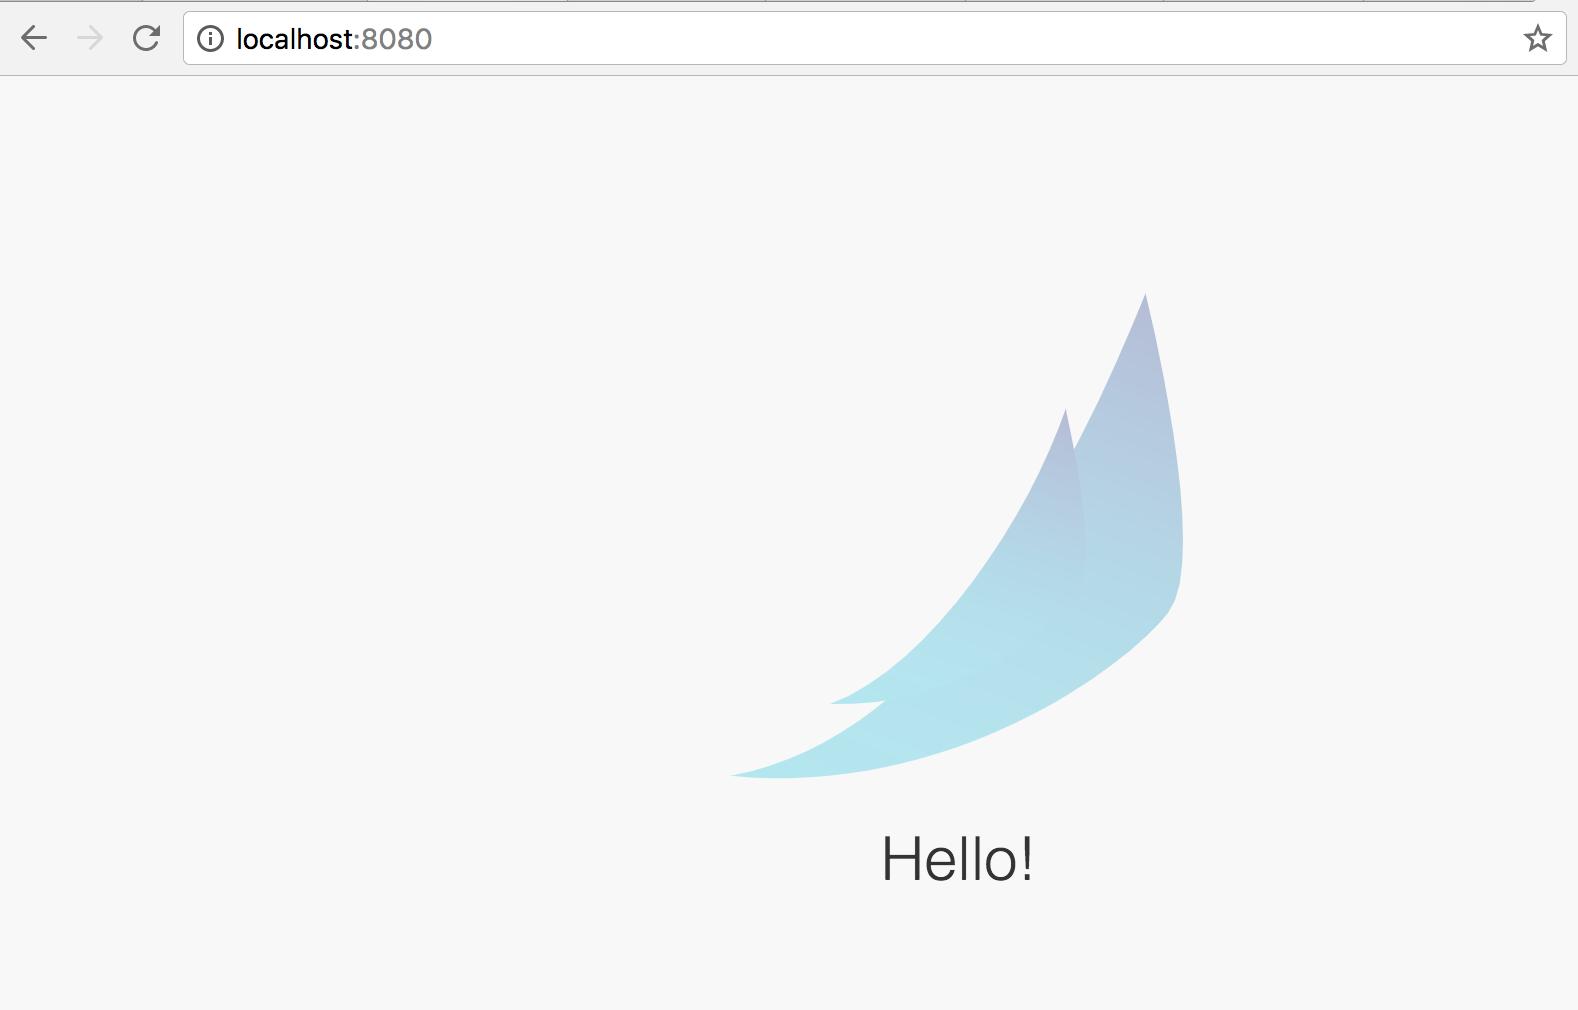 Welcome screen displaying Hello.